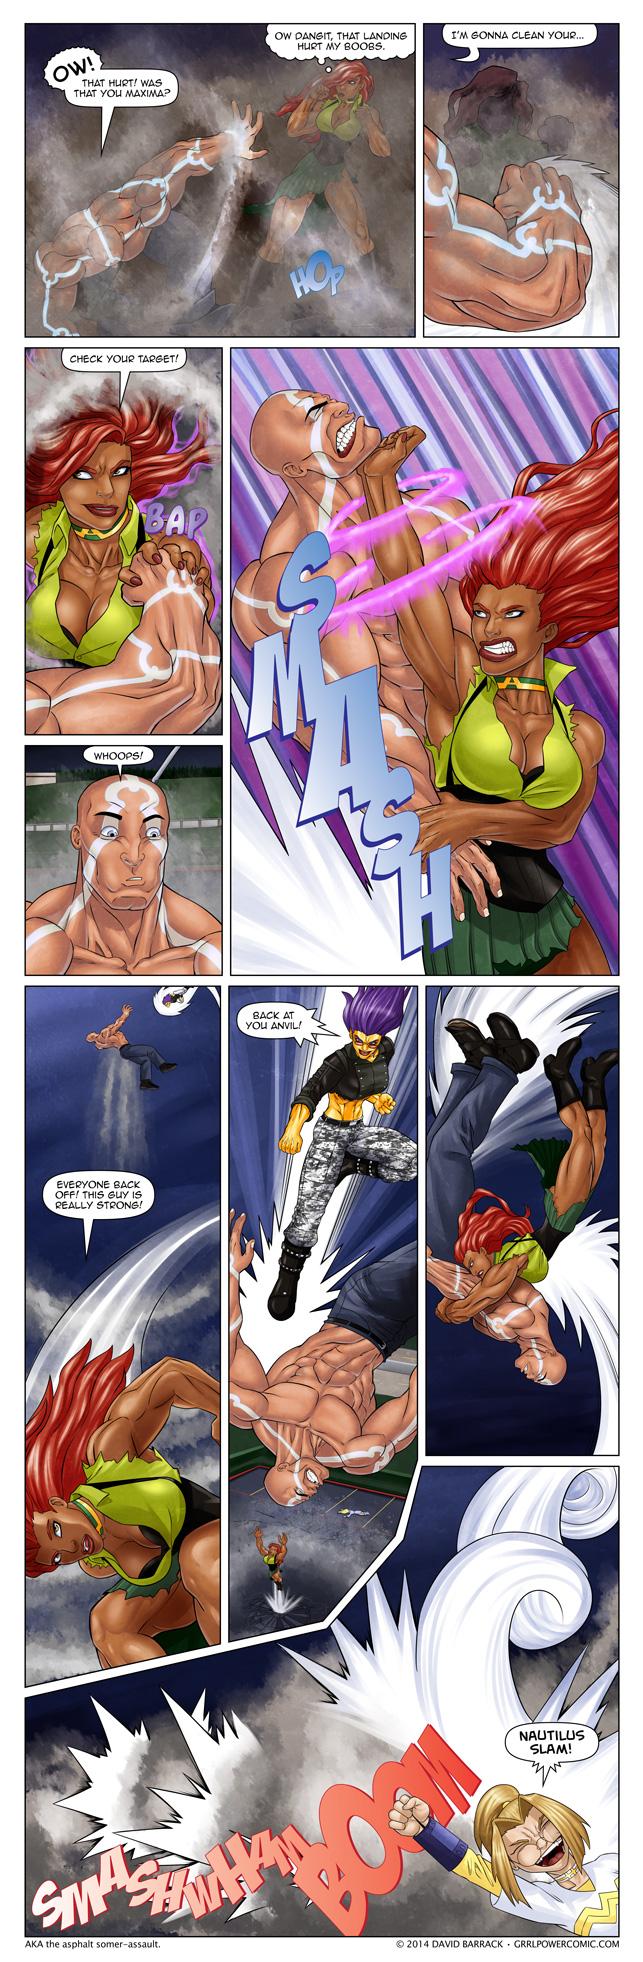 Grrl Power #255 – The ARC Wrestling Federation